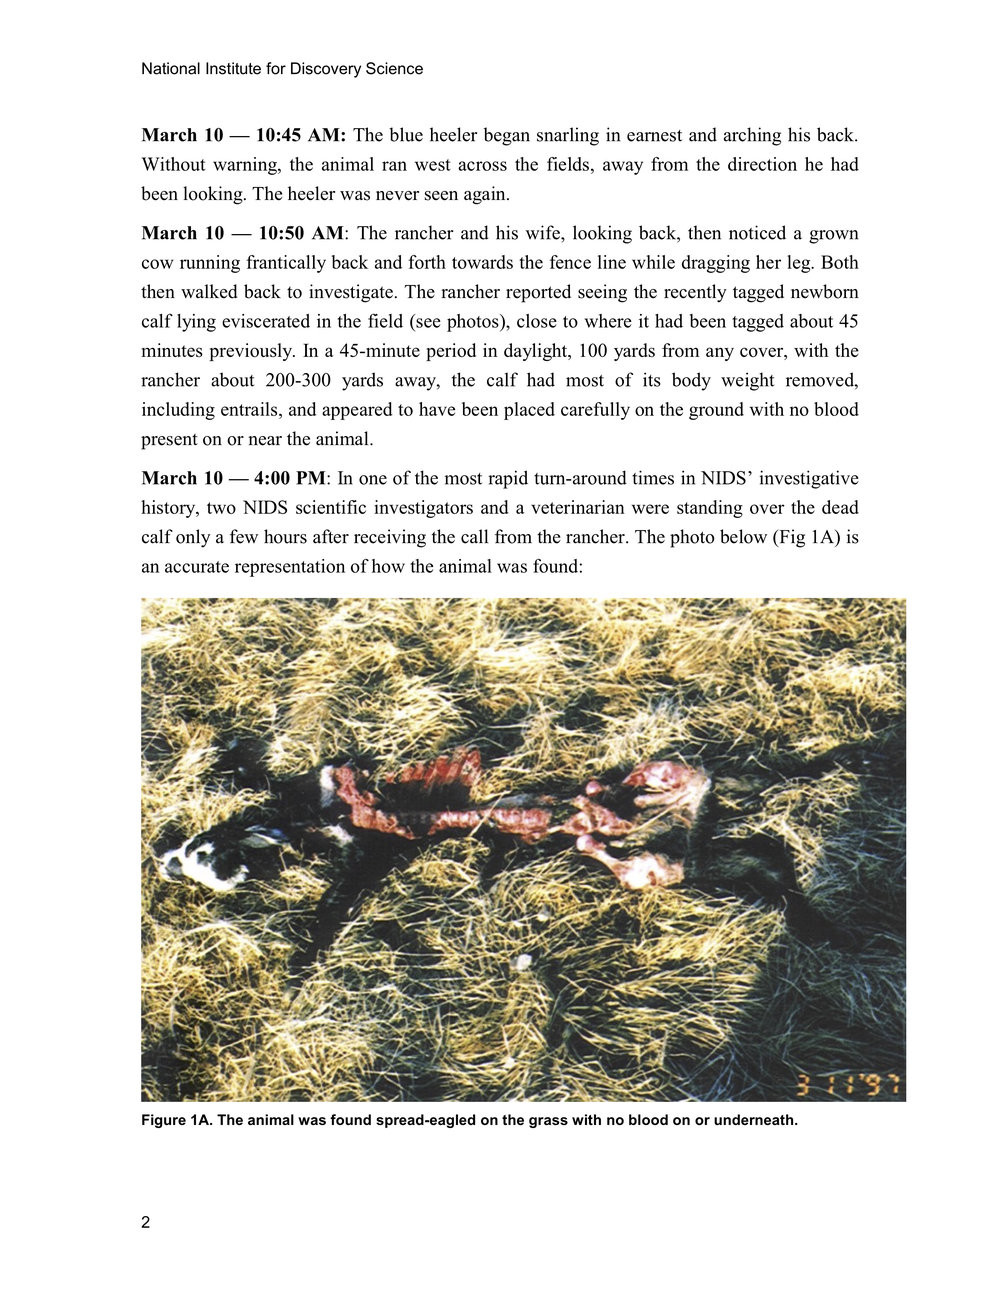 1997 ANIMAL MUTILATION REPORT 1.jpg